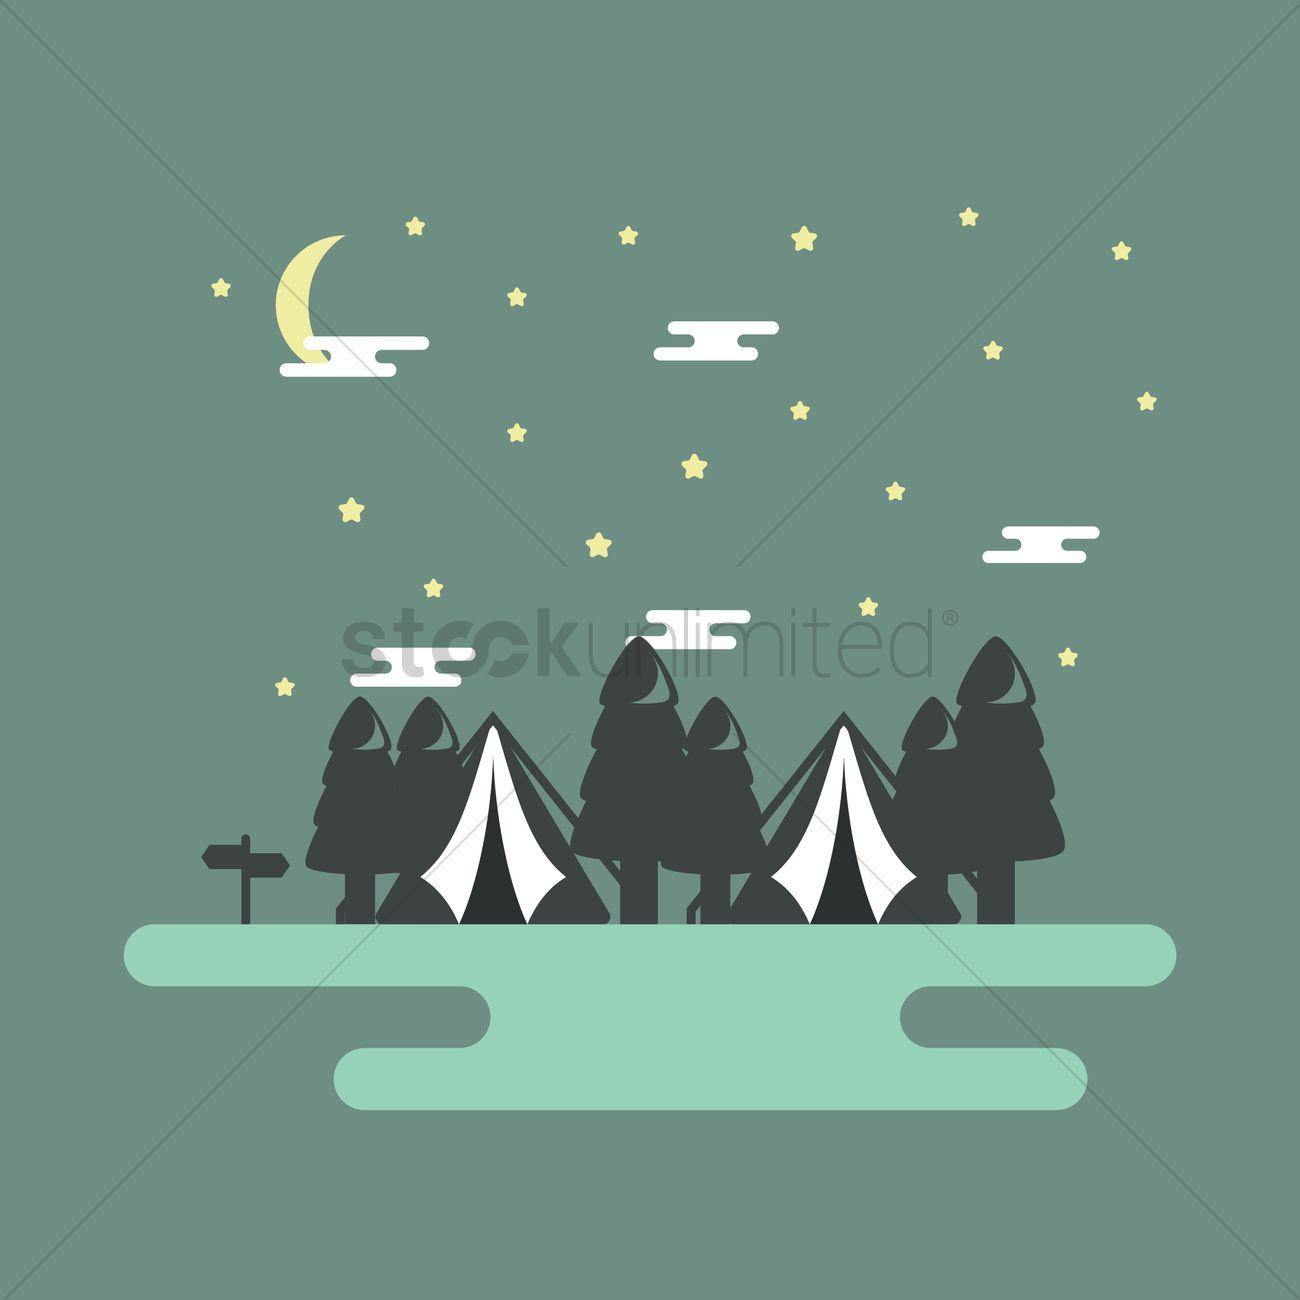 Camping Wallpaper Vector Image 1703562 Stockunlimited